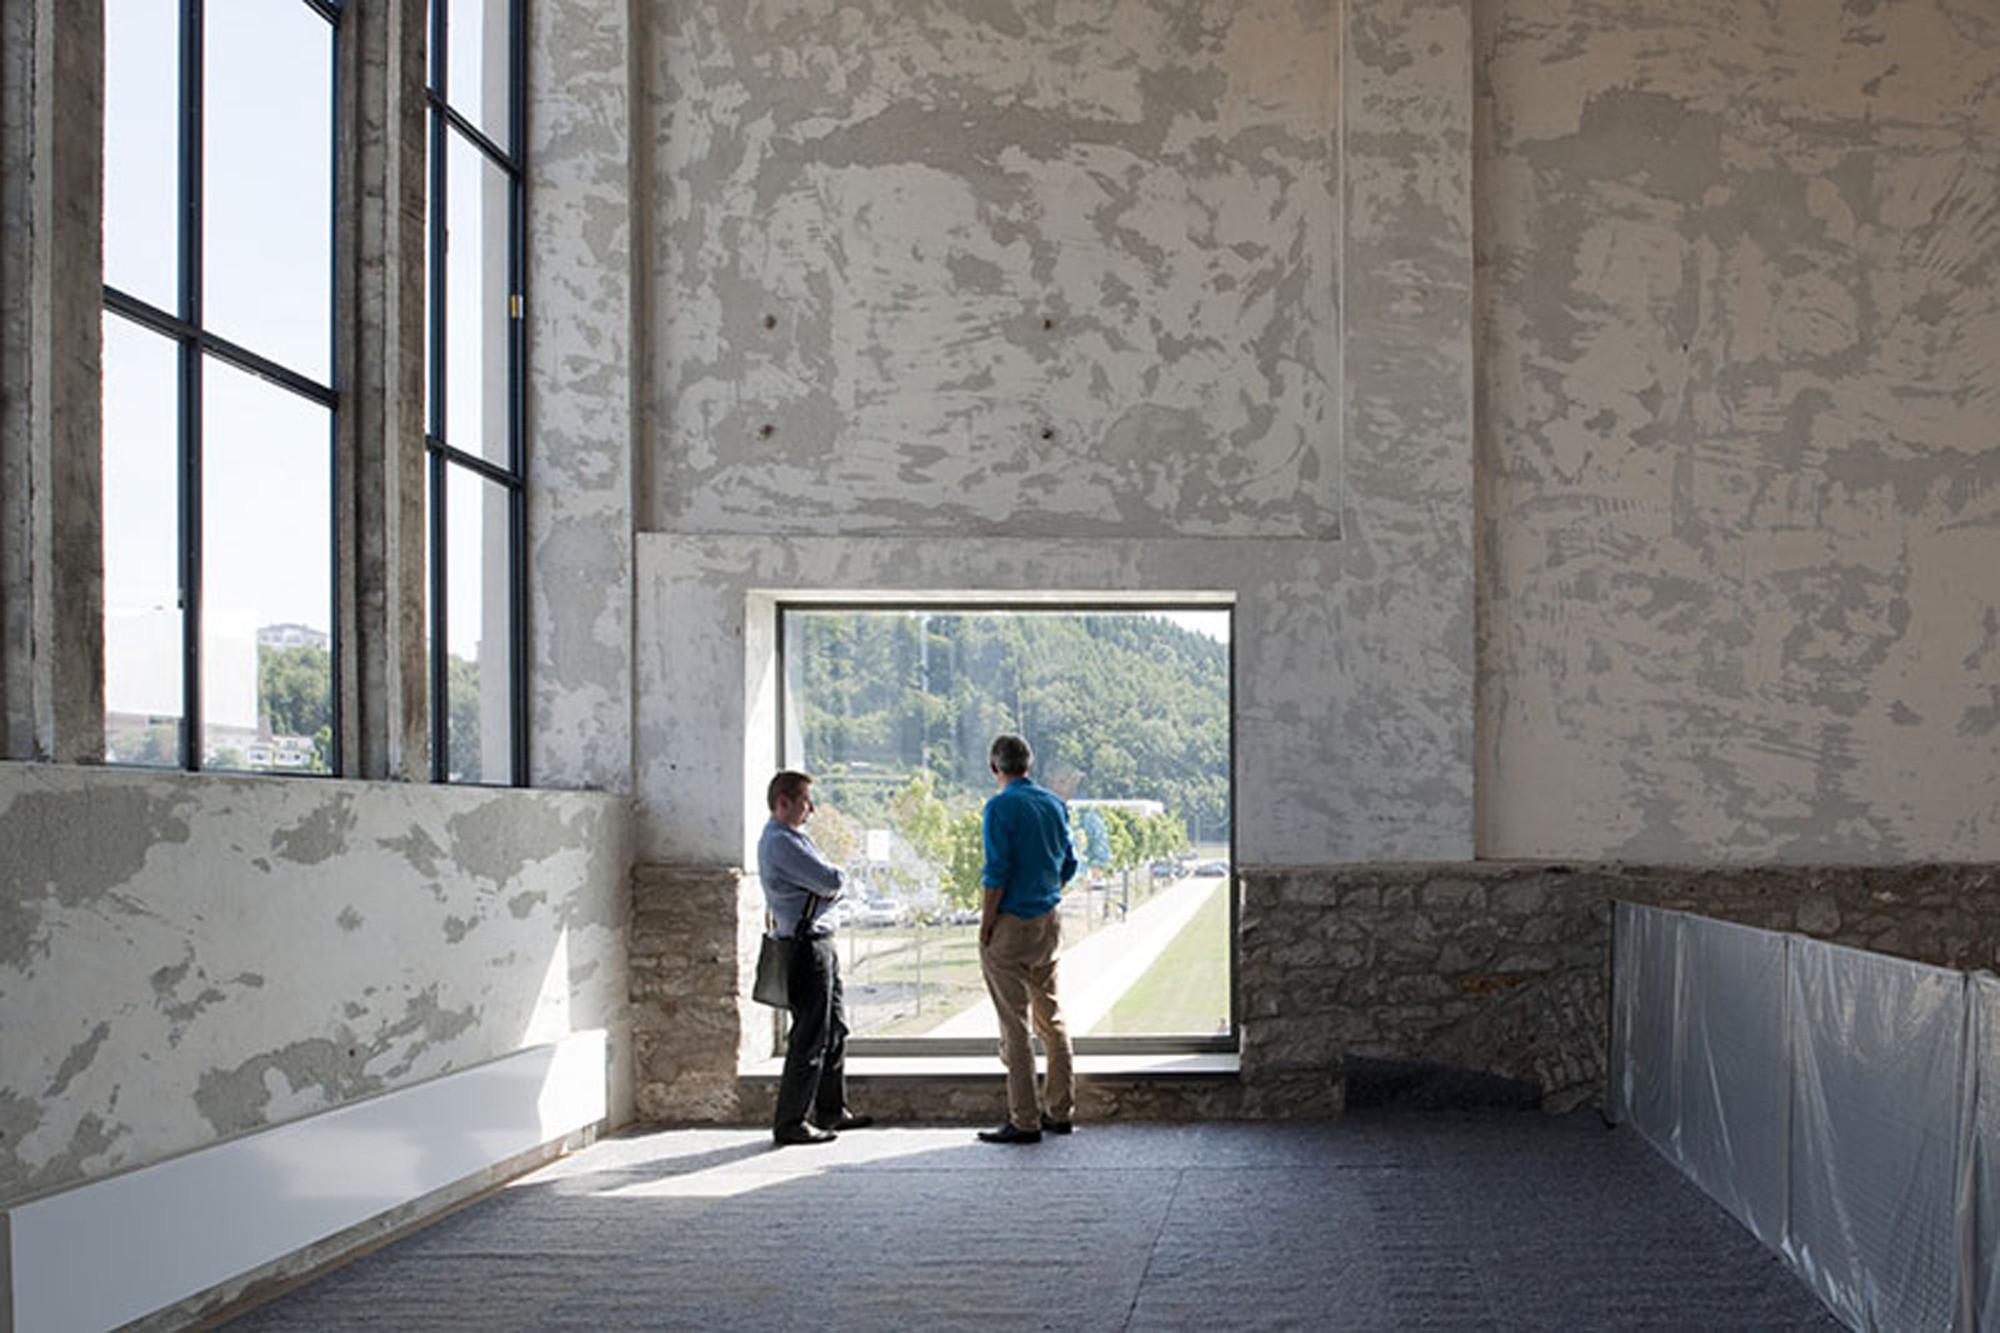 Hall 32 / Heinrich Böll Architekt, © Thomas Mayer